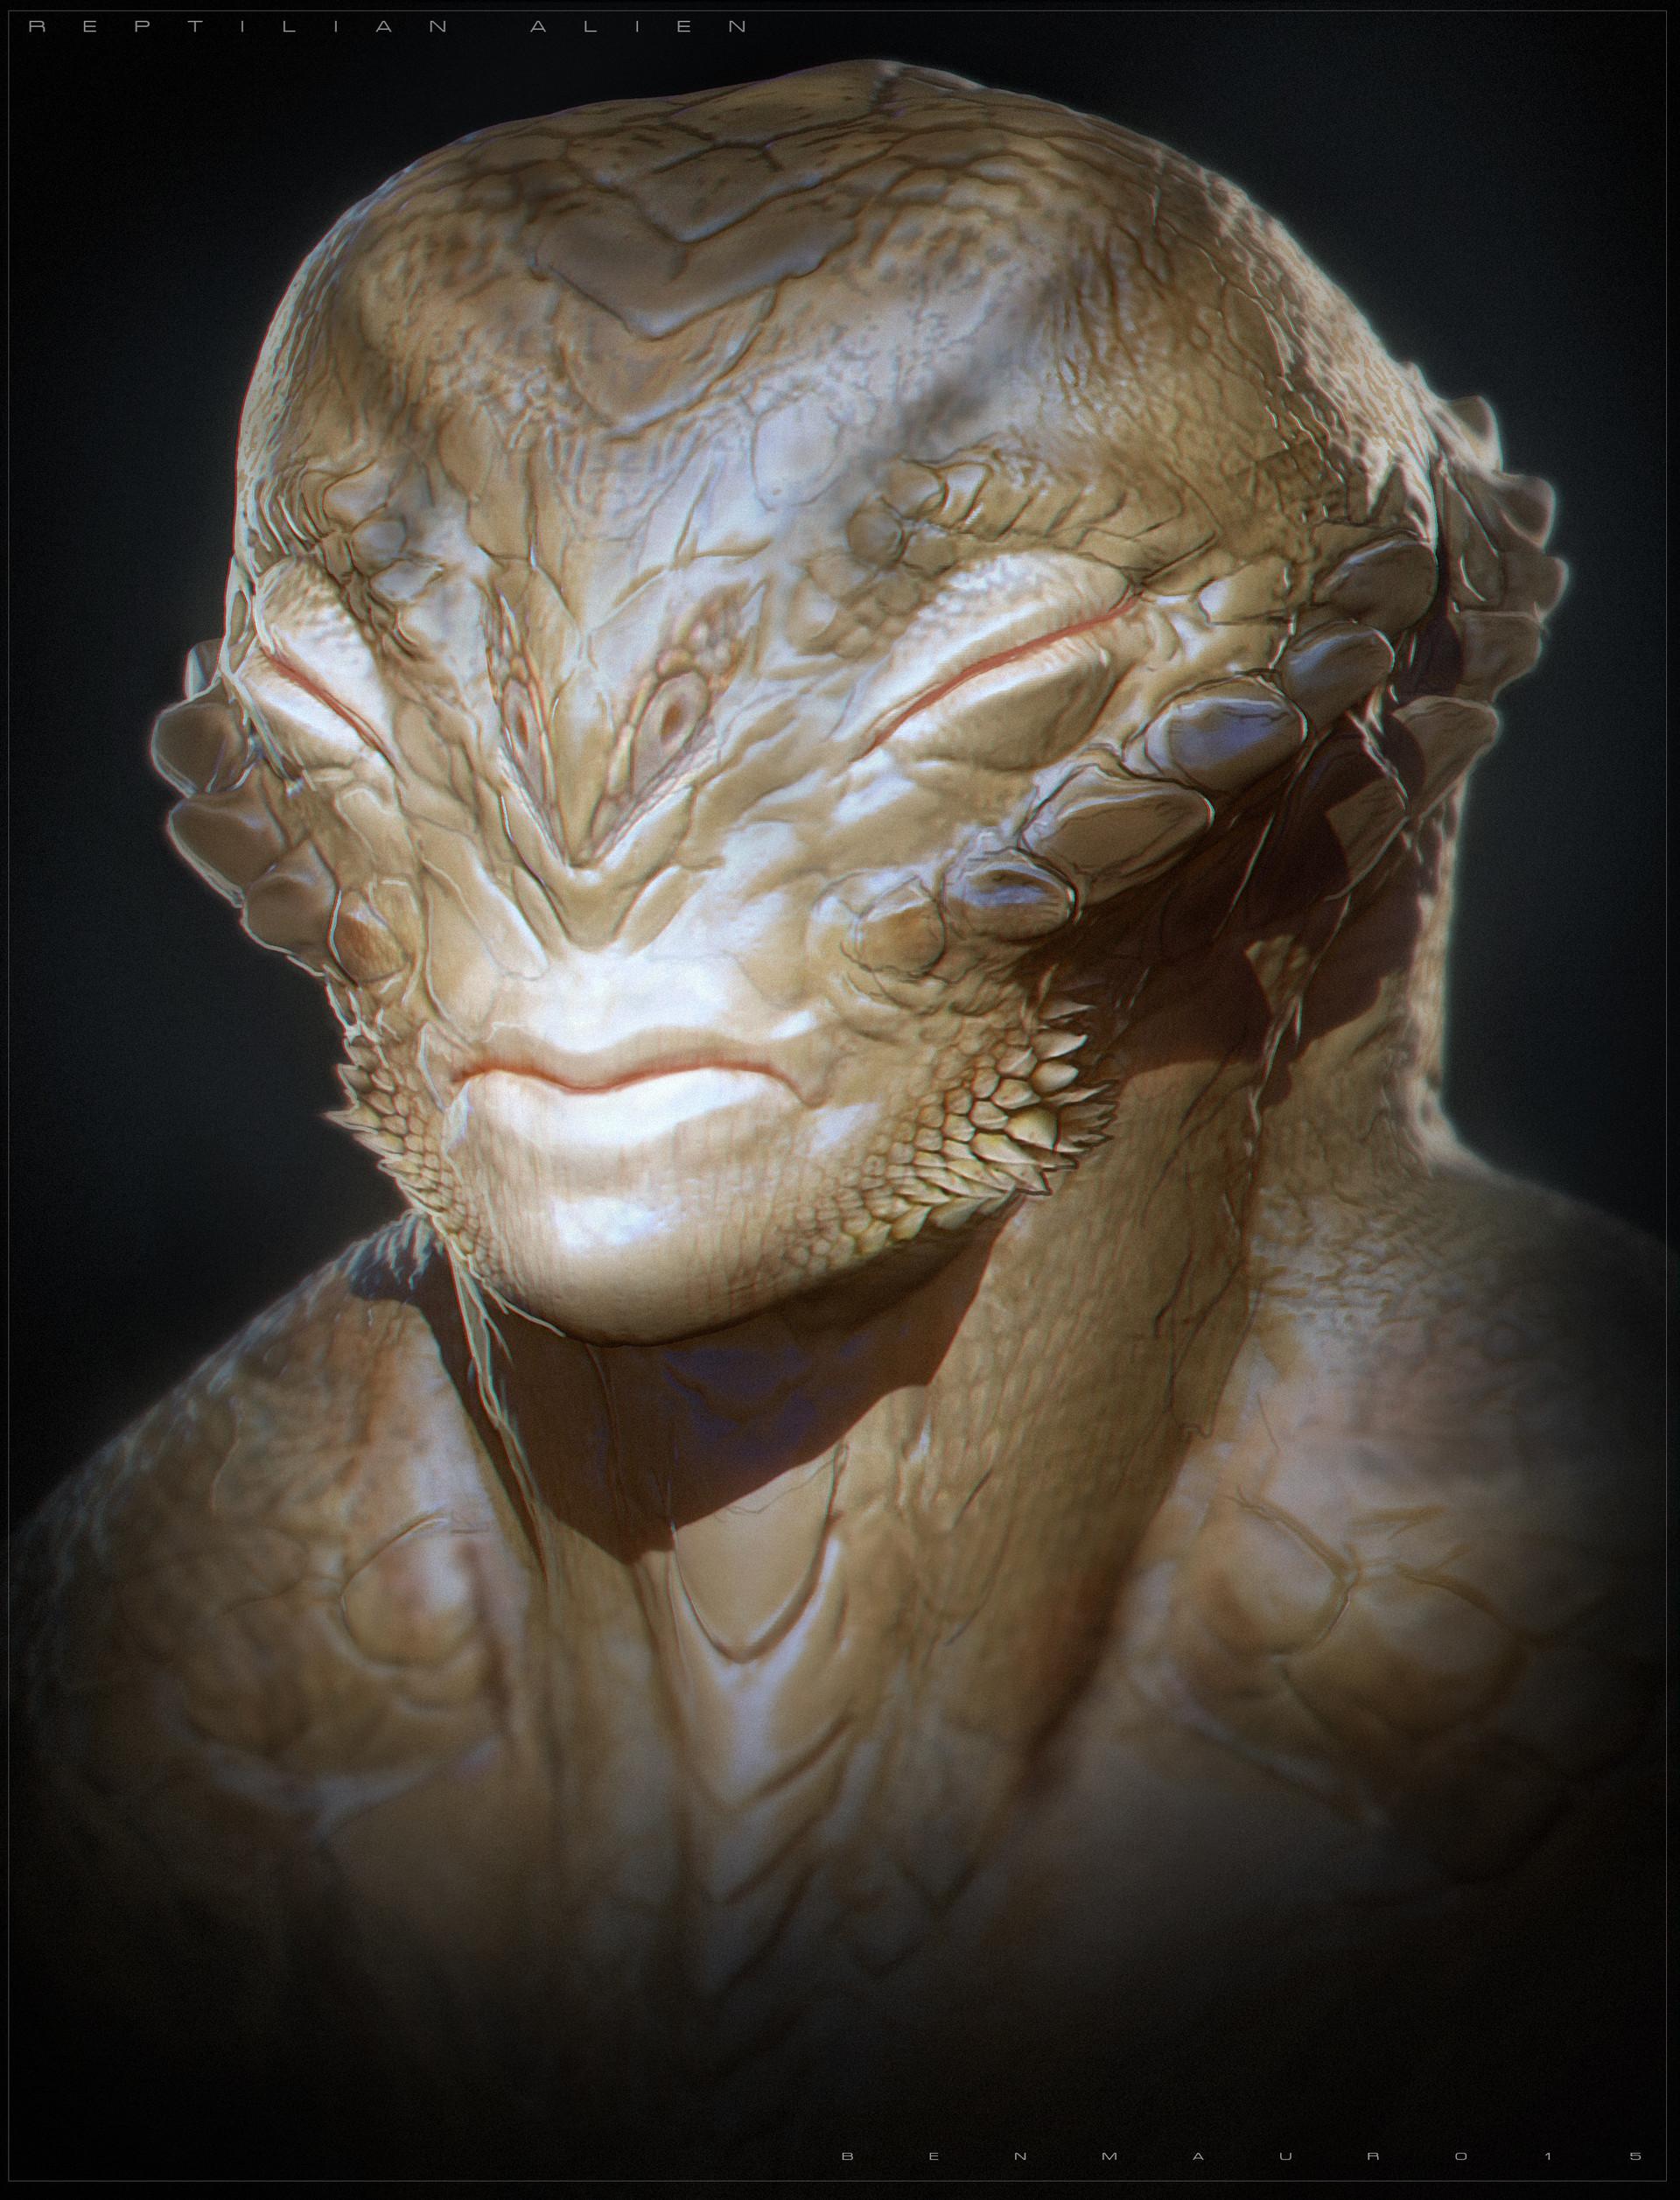 ben-mauro-lizard-alien-01b-bm-1.jpg